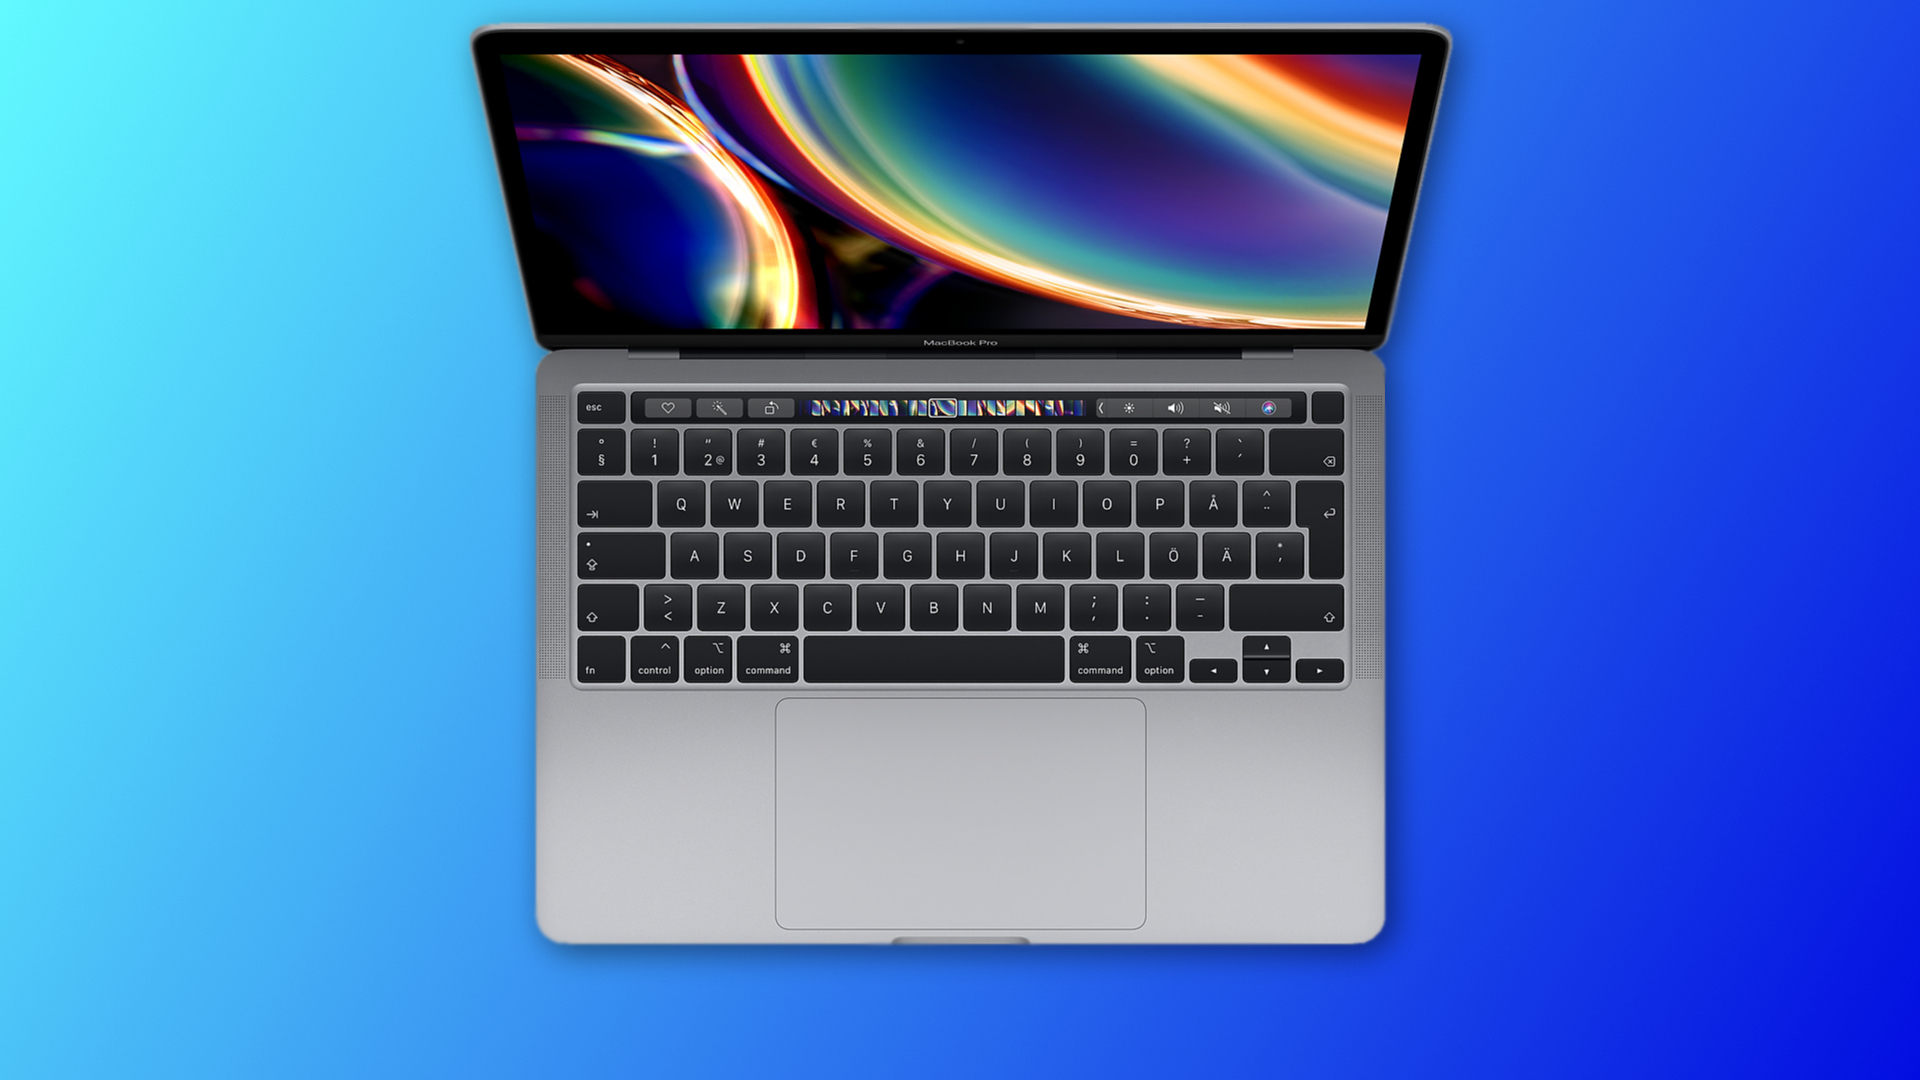 Mac Macbook Pro 13 WWDC